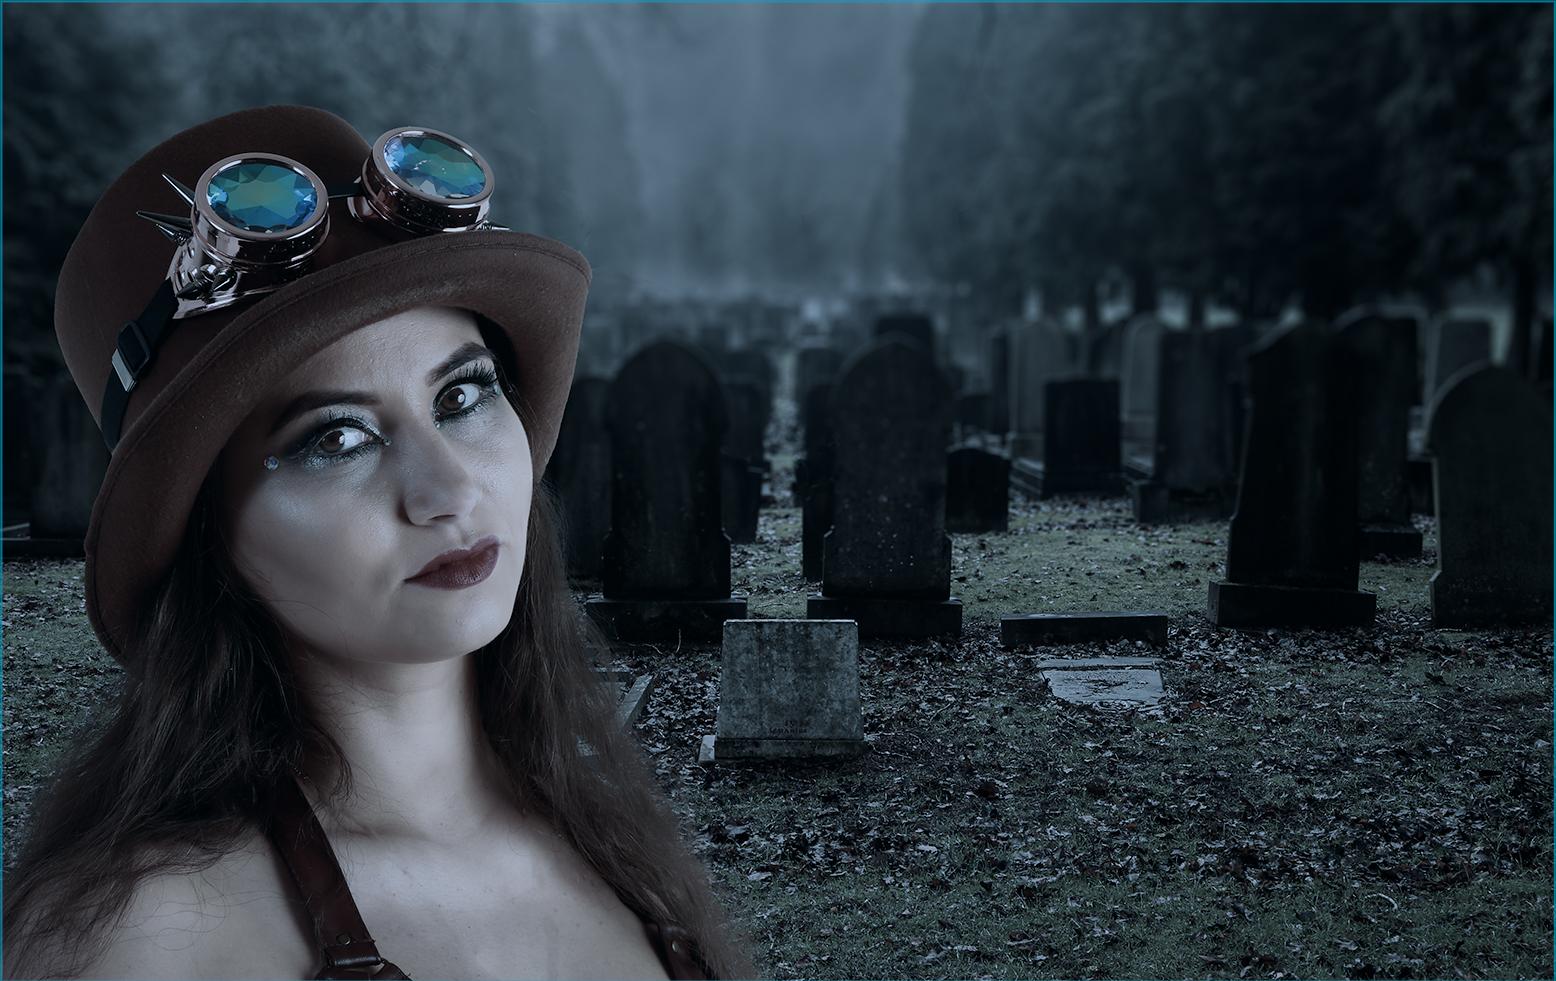 1_Penelope-in-Graveyard